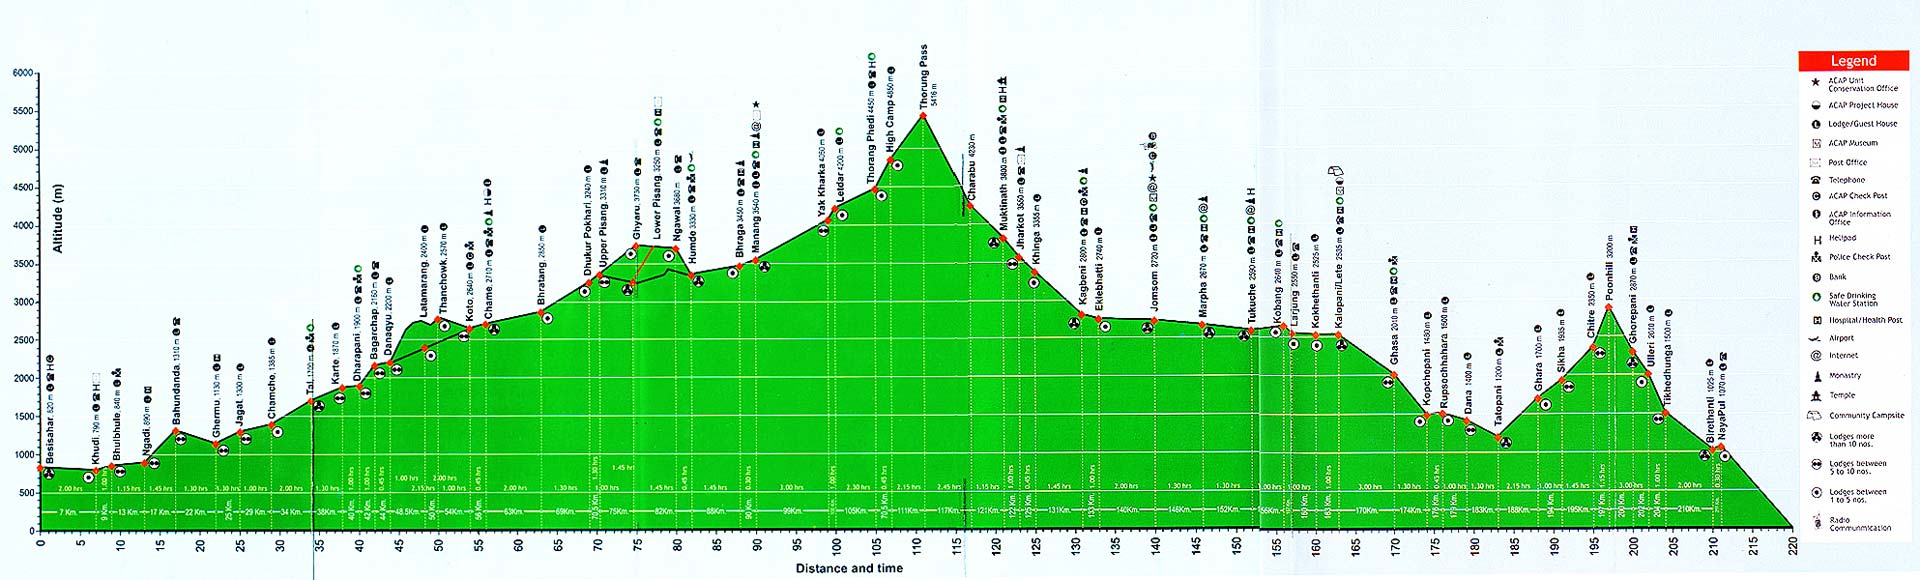 Annapurna Circuit: Höhenprofil Karte